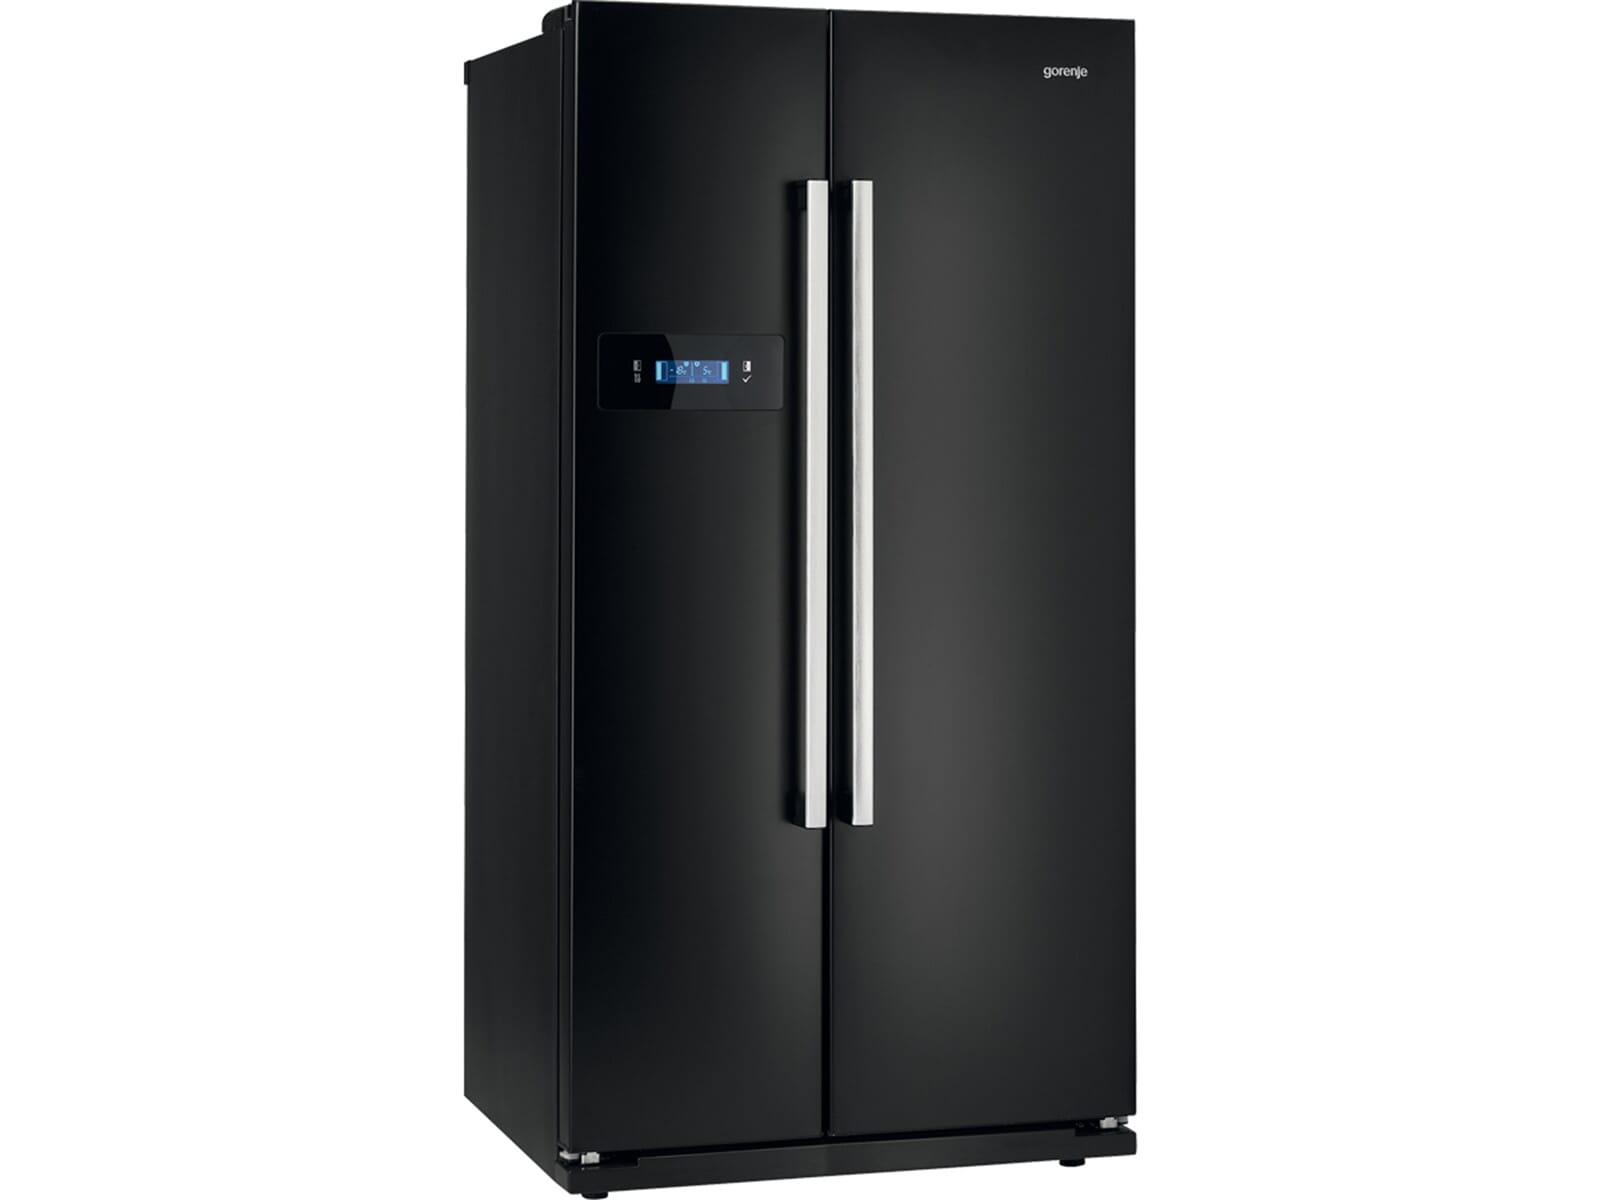 Gorenje Kühlschrank Einbau : Test einbaukühlschrank gorenje rbi e